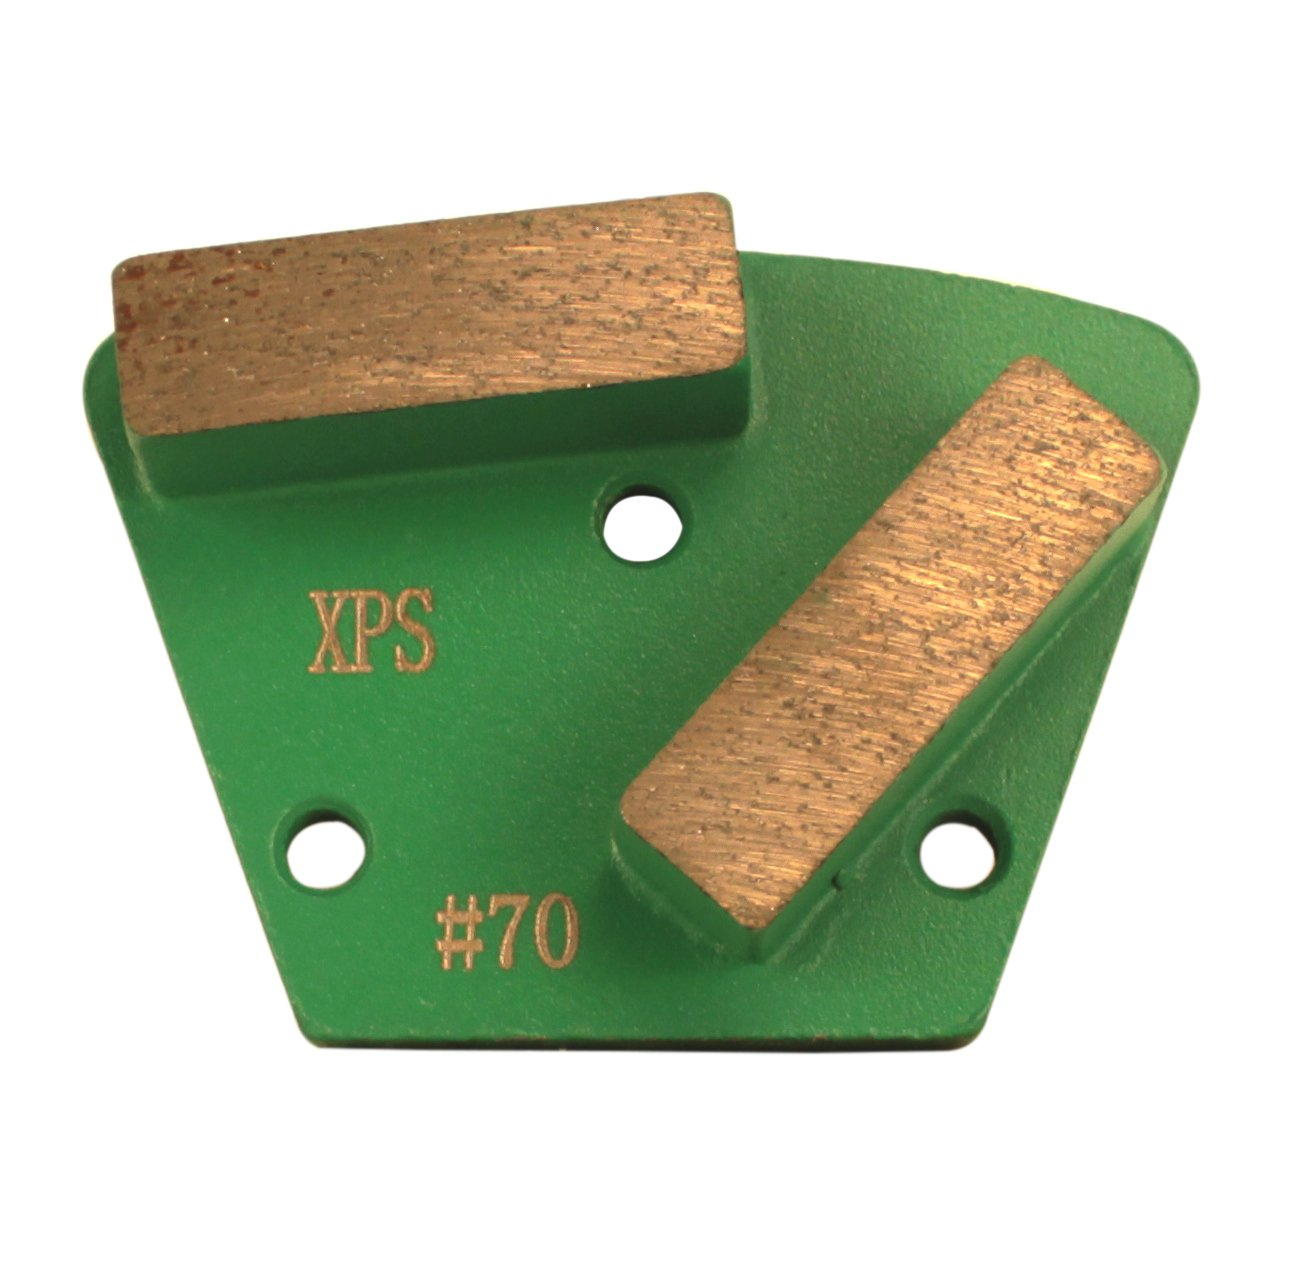 Surface Prep Stones Polished Concrete Grinding Pads 15mm Segment Trapezoid Discs (30/40 Grit)